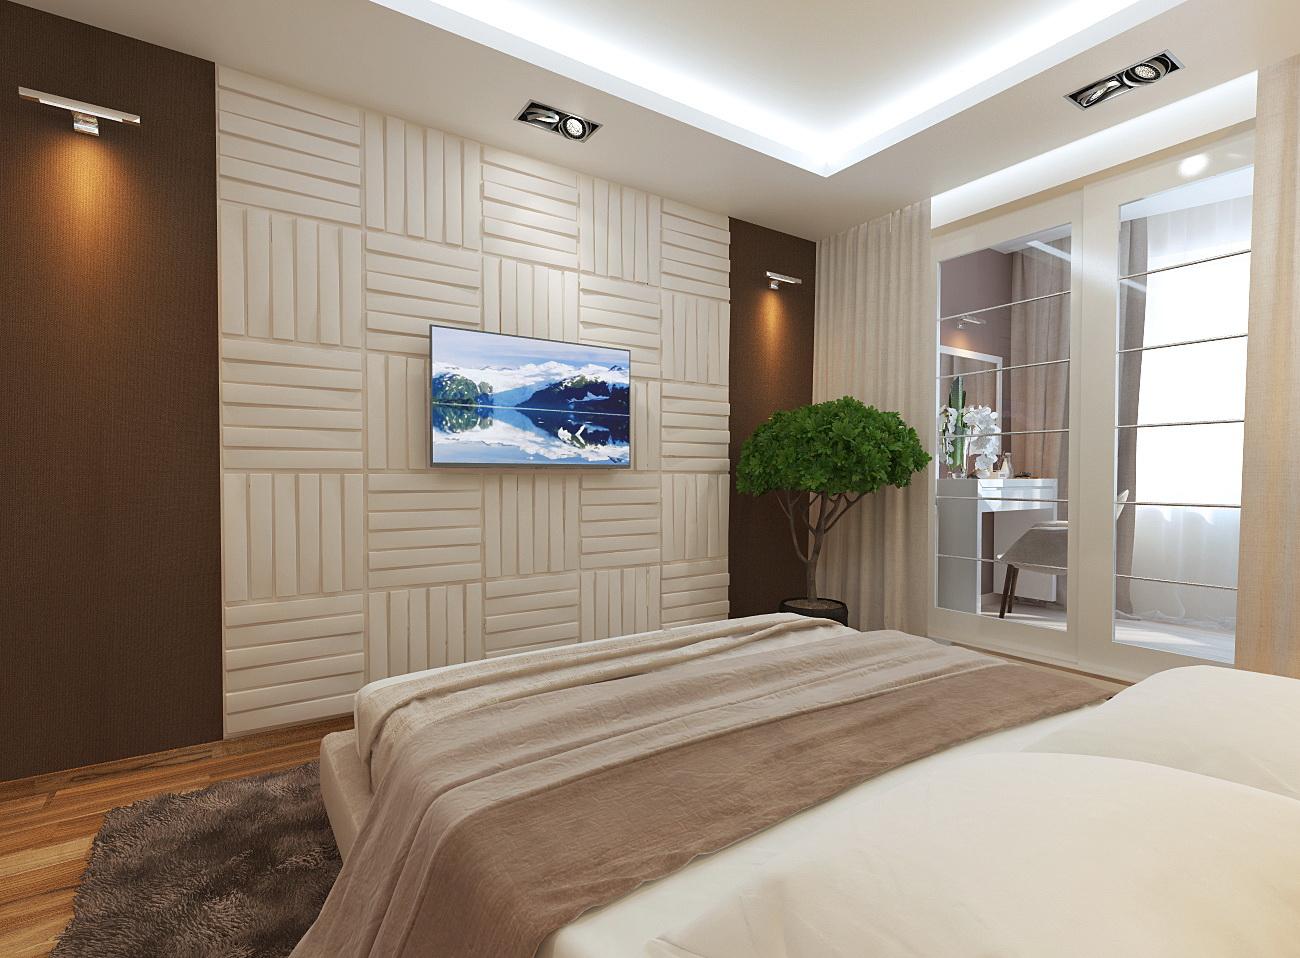 Dizajn-spalni-14-kv-m-v-sovremennom-stile-6